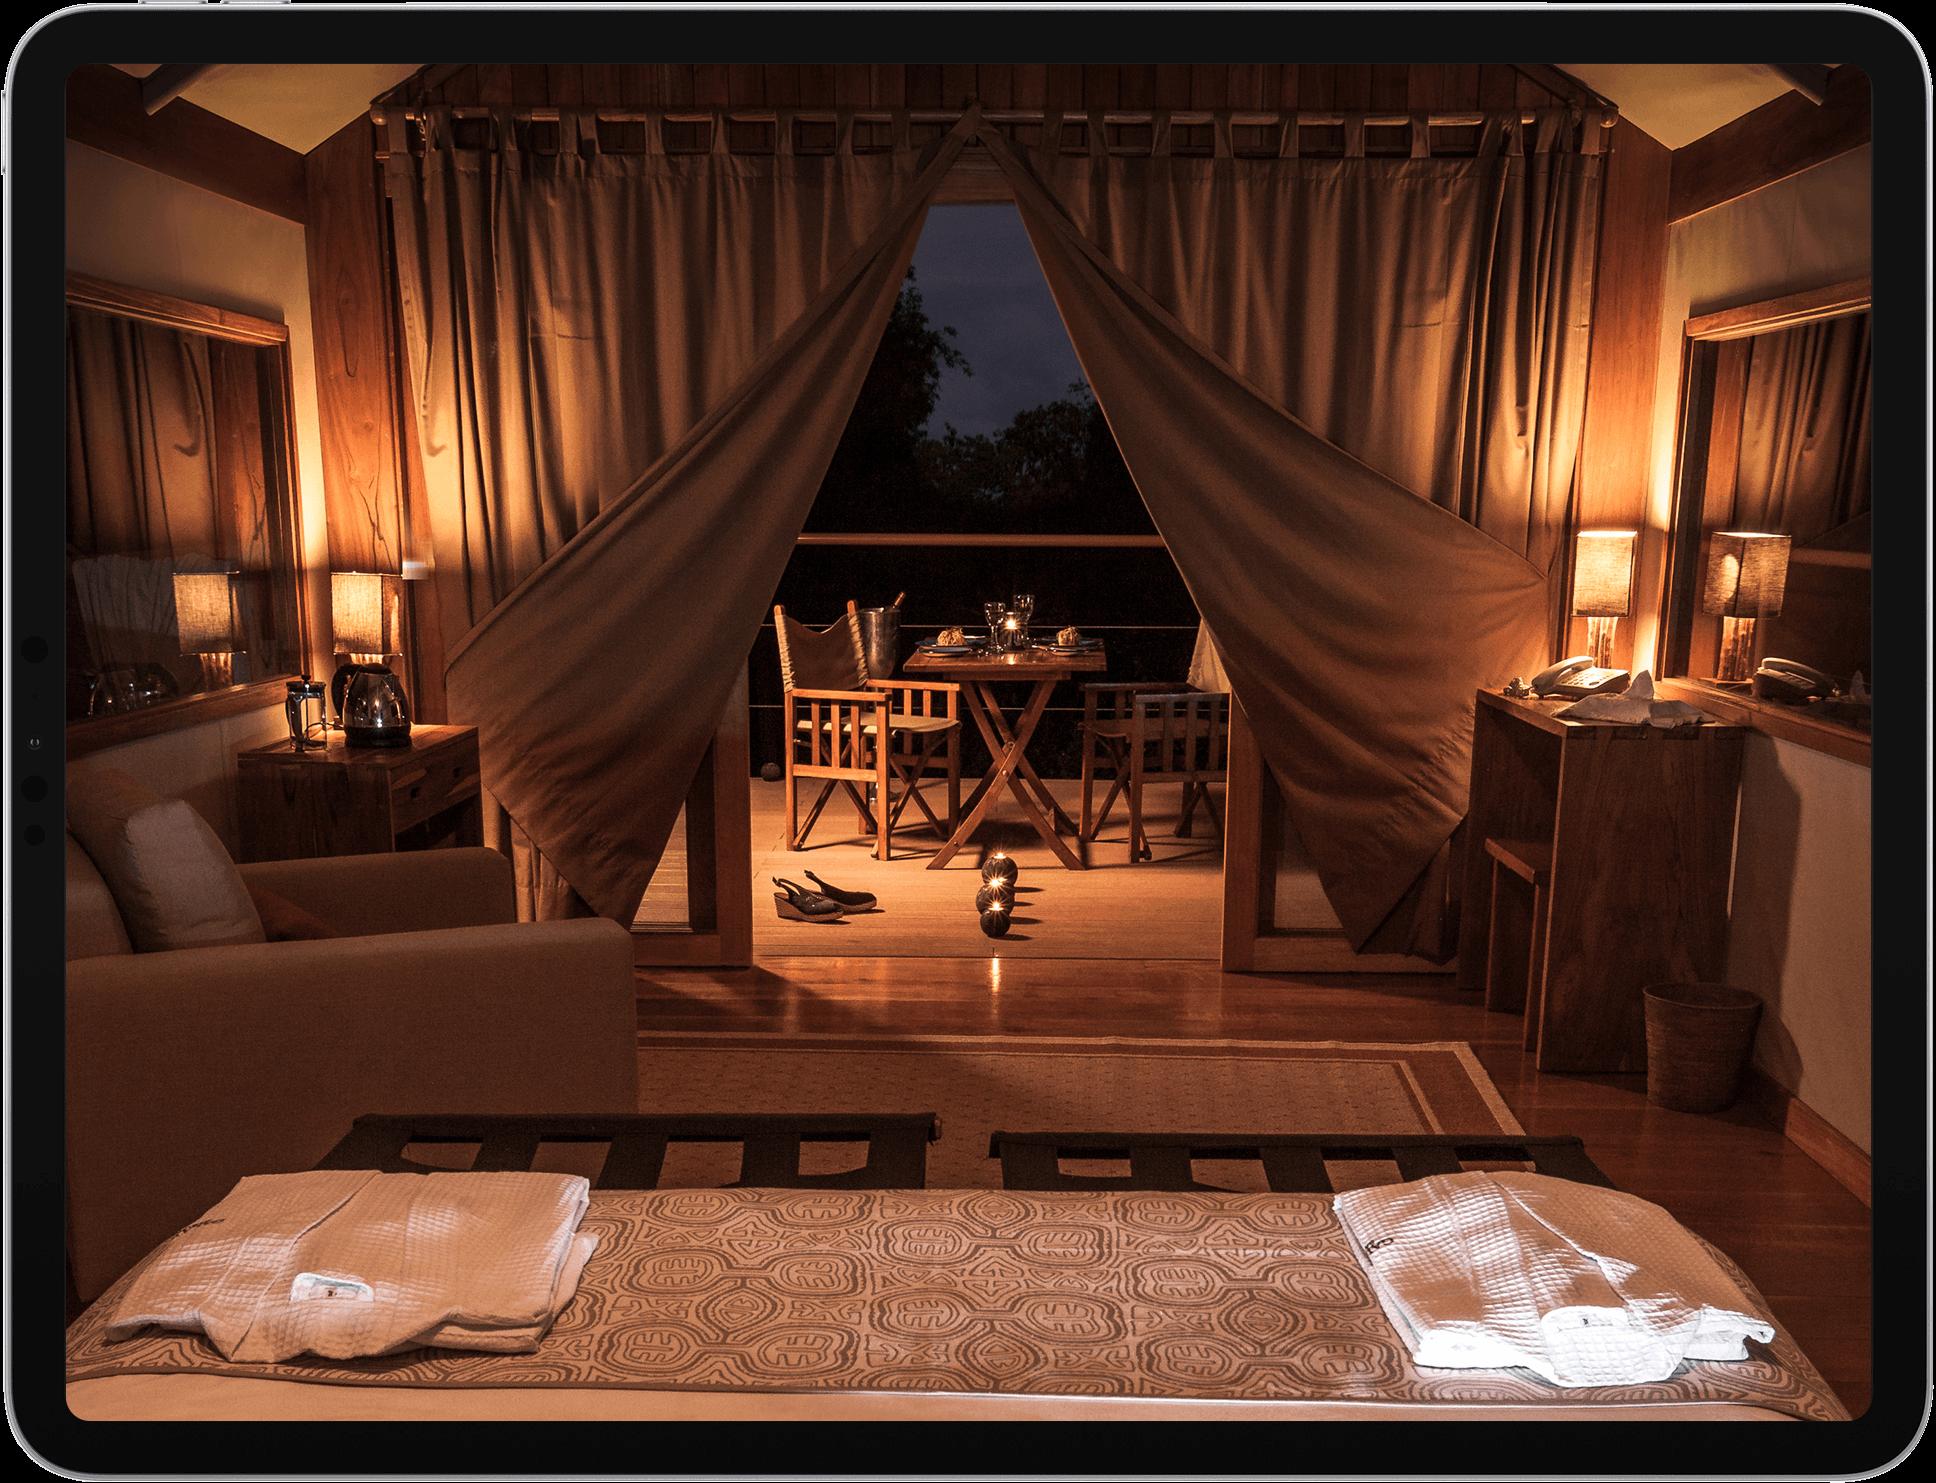 Proyecto web para Galapagos Safari Camp elaborado por Design Republik